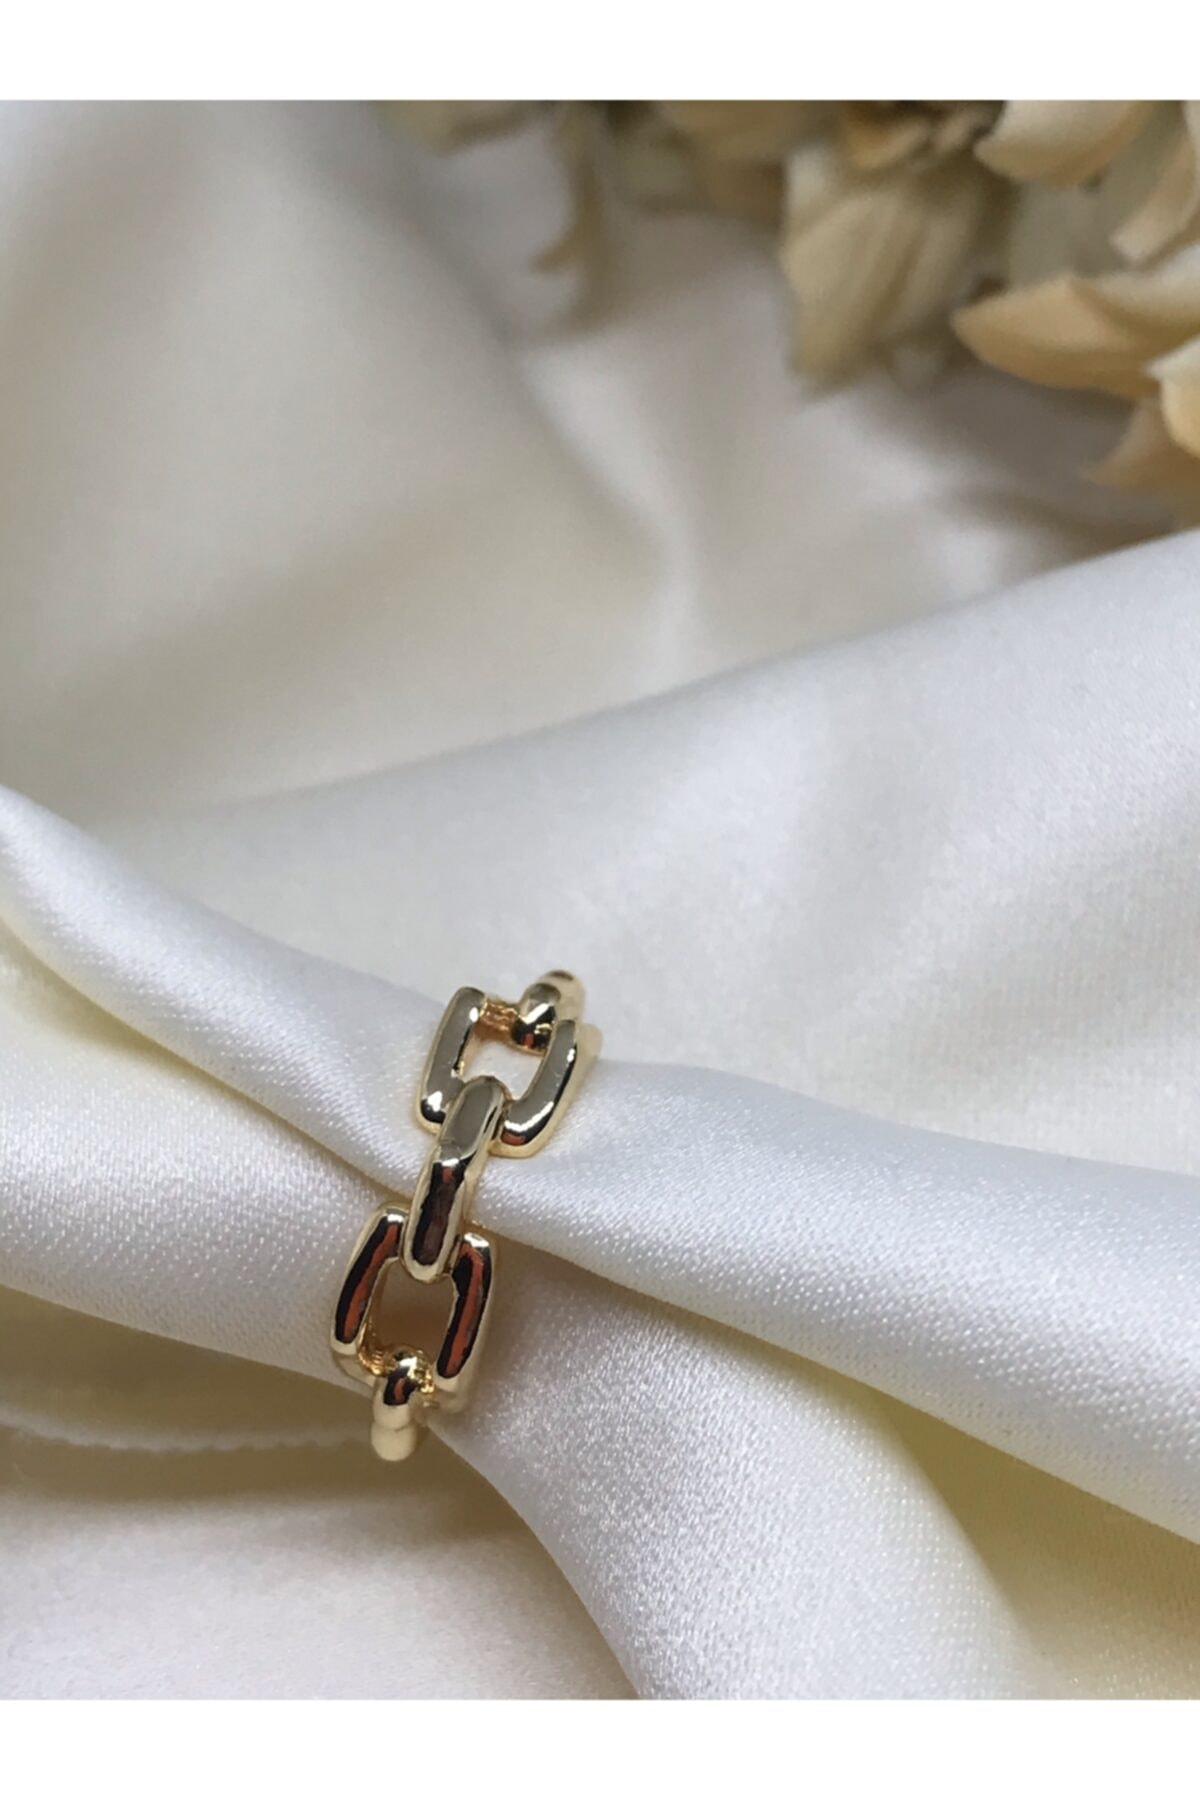 D'mare Accessories Altın Kaplama Zincir Detay Yüzük 1